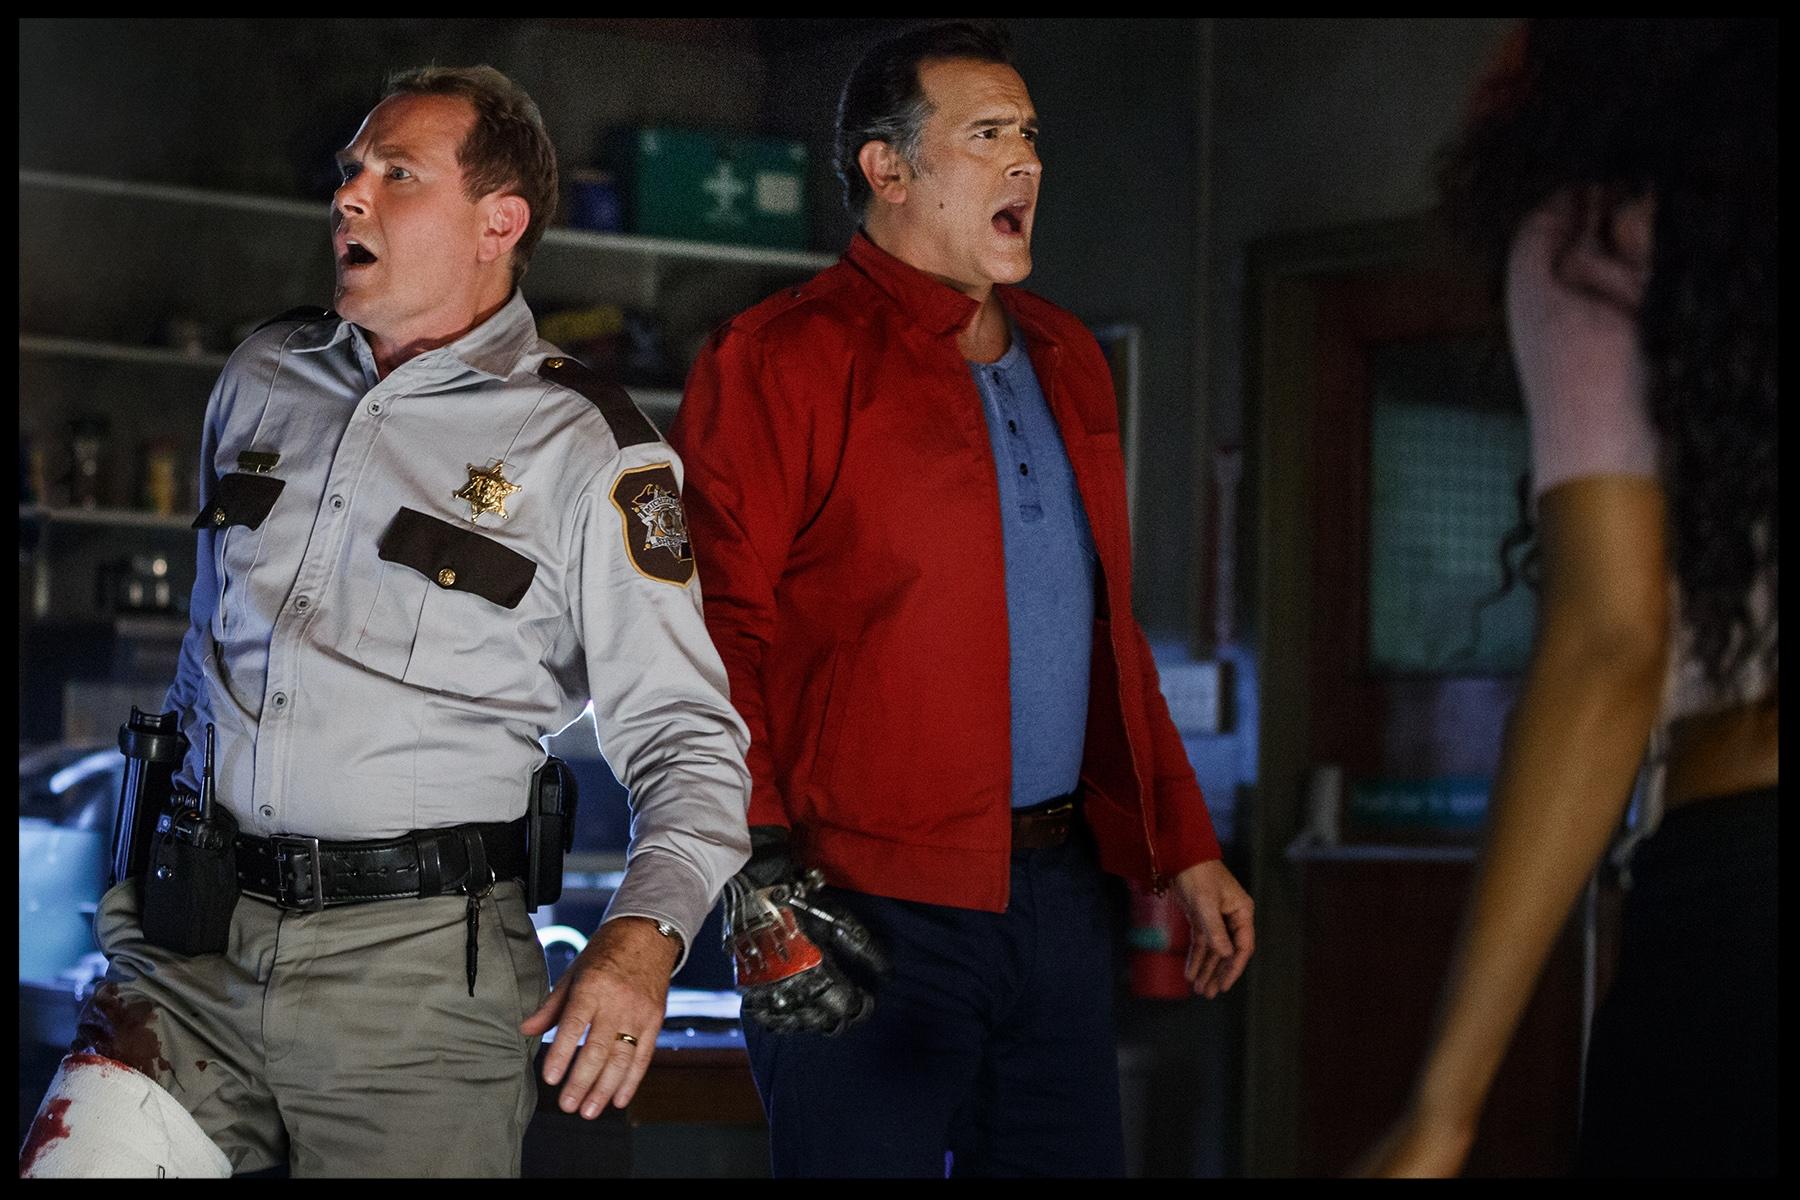 Stephen+Lovat+(Sheriff+Thomas+Emery)+and+Bruce+Campbell+(Ash)+-+205.jpg